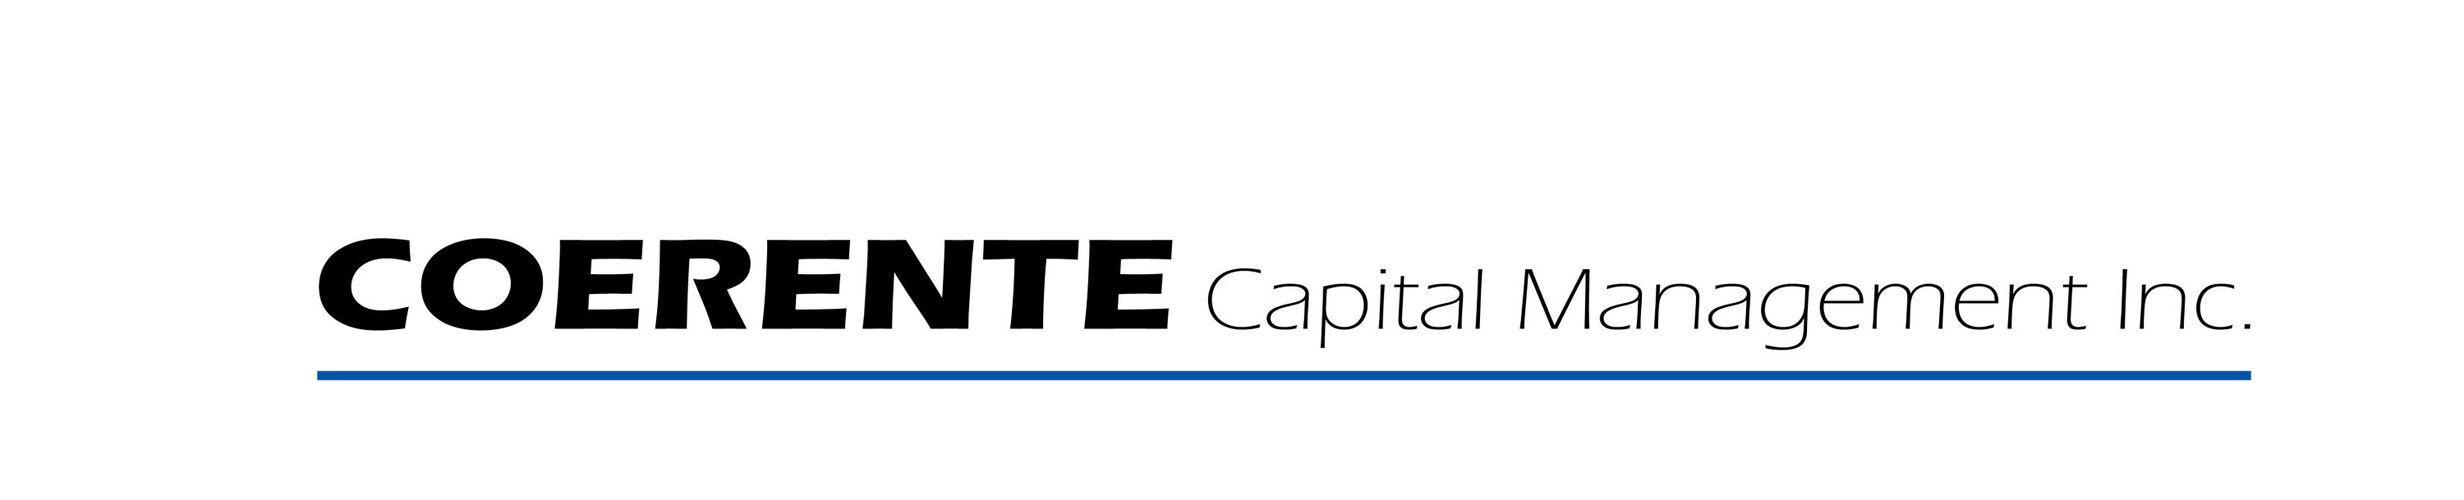 Coerente Capital Management